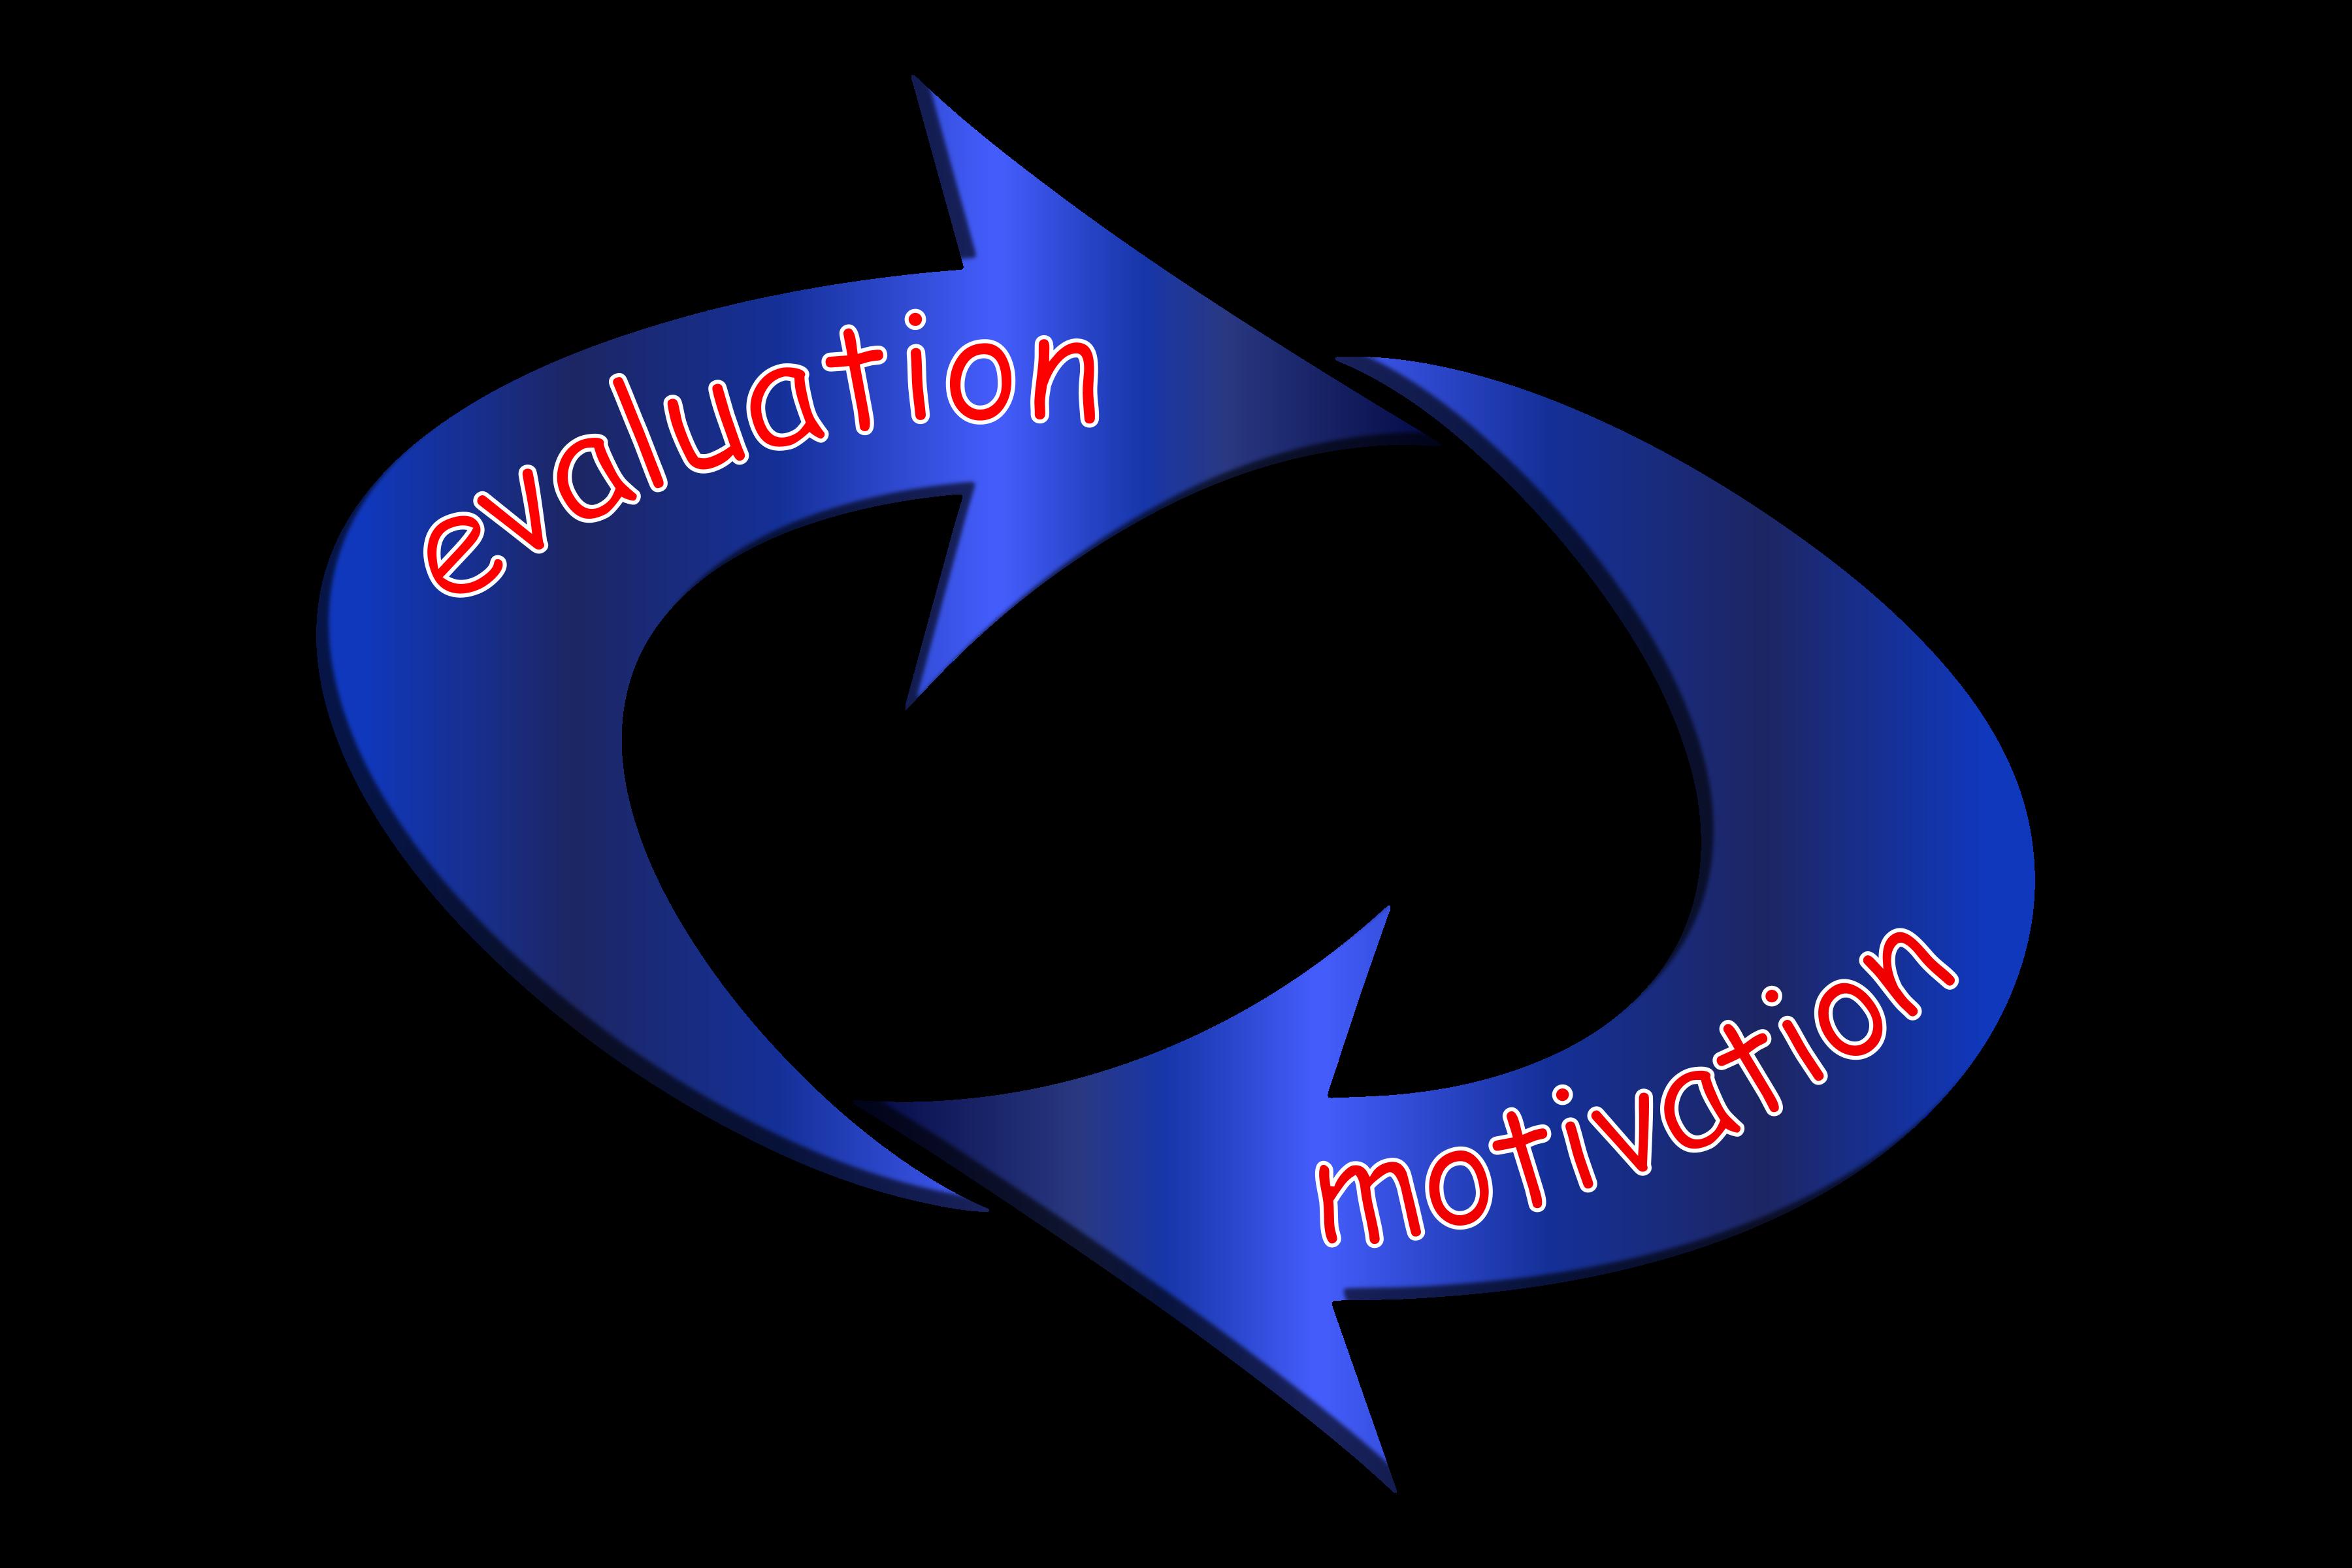 banner royalty free download Evaluation loop big image. Motivation clipart